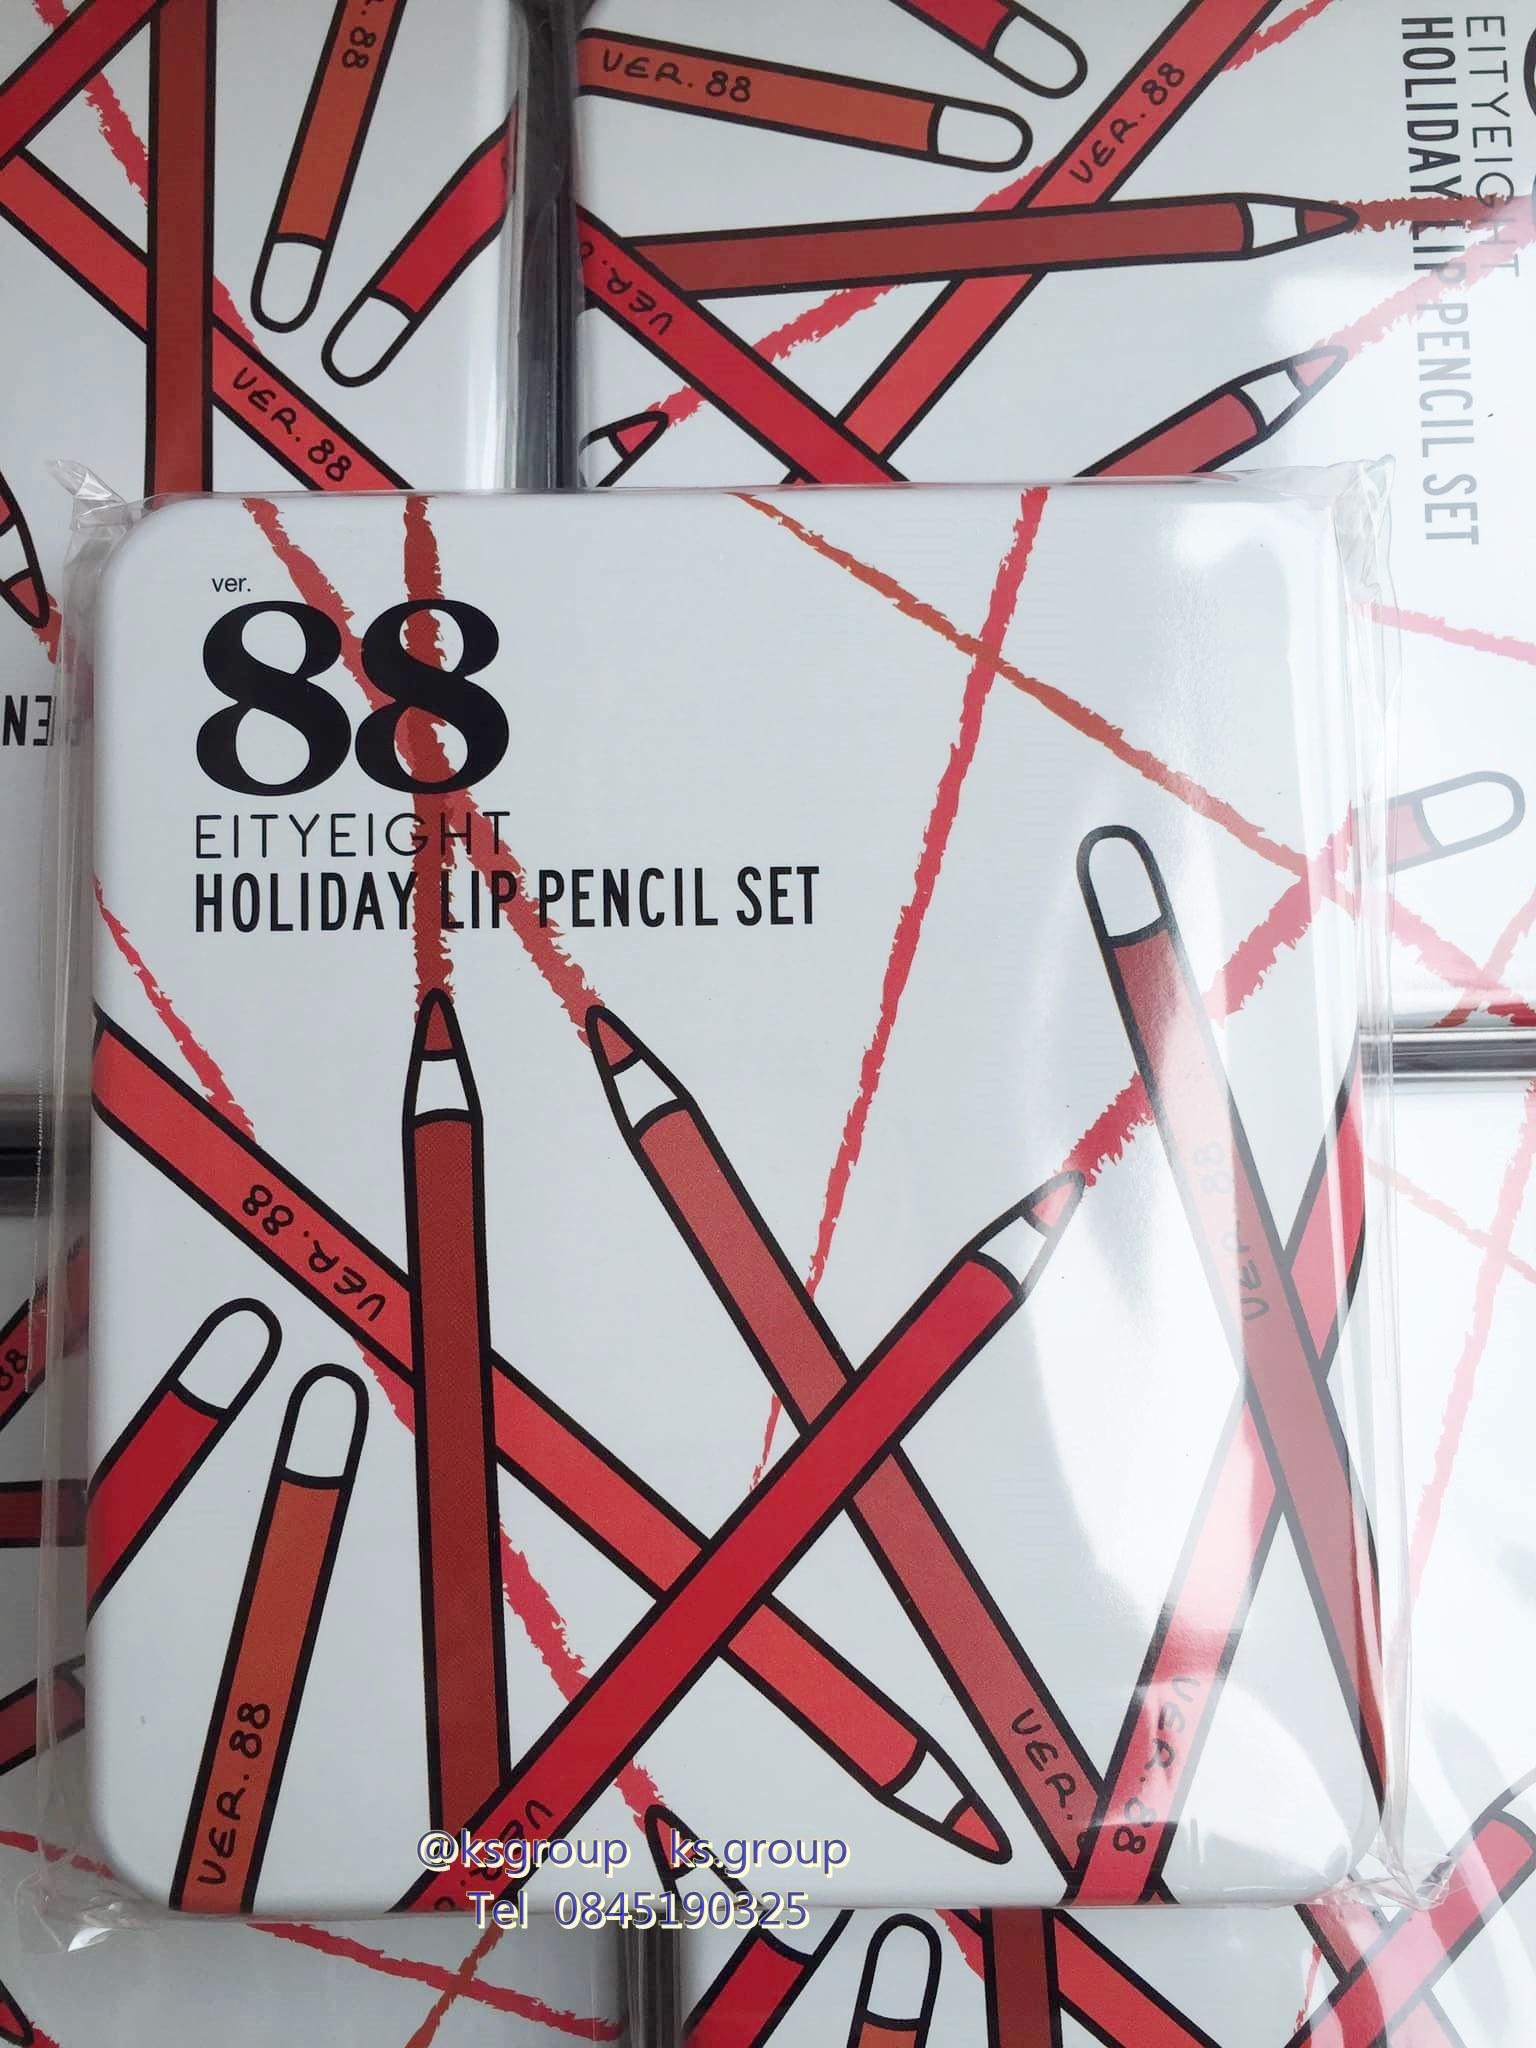 Ver 88 Eity Eight Holiday Lip Pencil Set Eighty 1